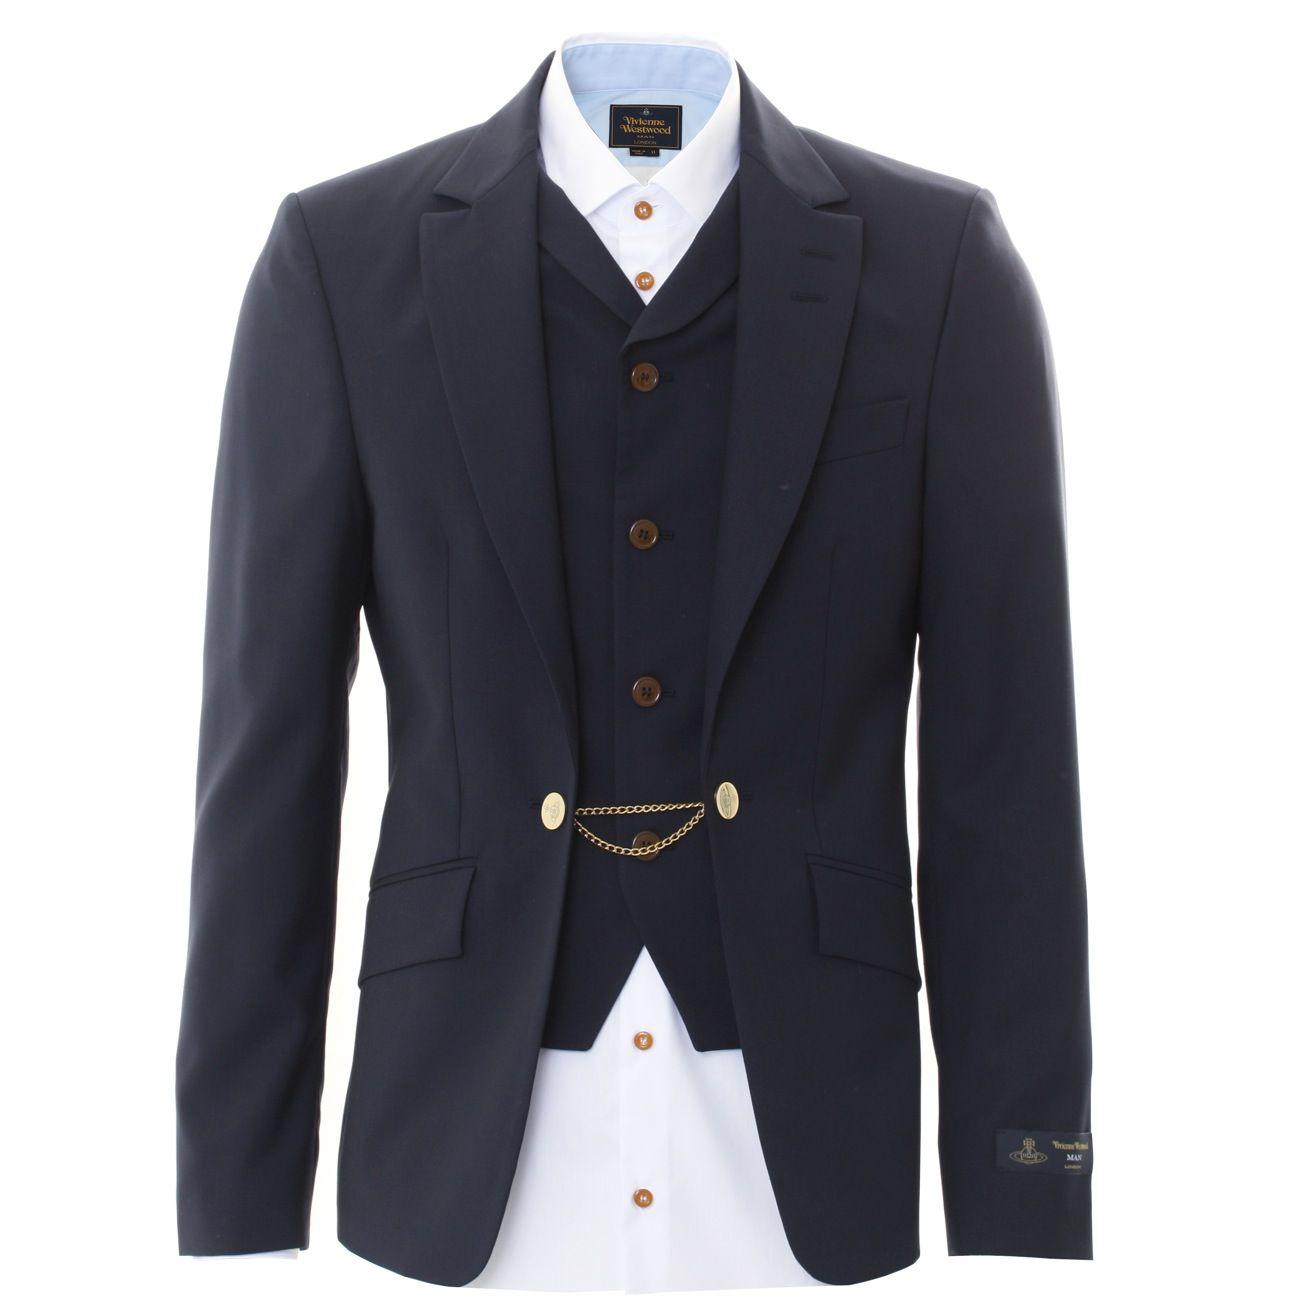 2d4adc345c8 Vivienne Westwood : Blazer Jackets : Blazer & Waistcoat Chain Detail in  Navy : John Anthony Mens Designer Clothes